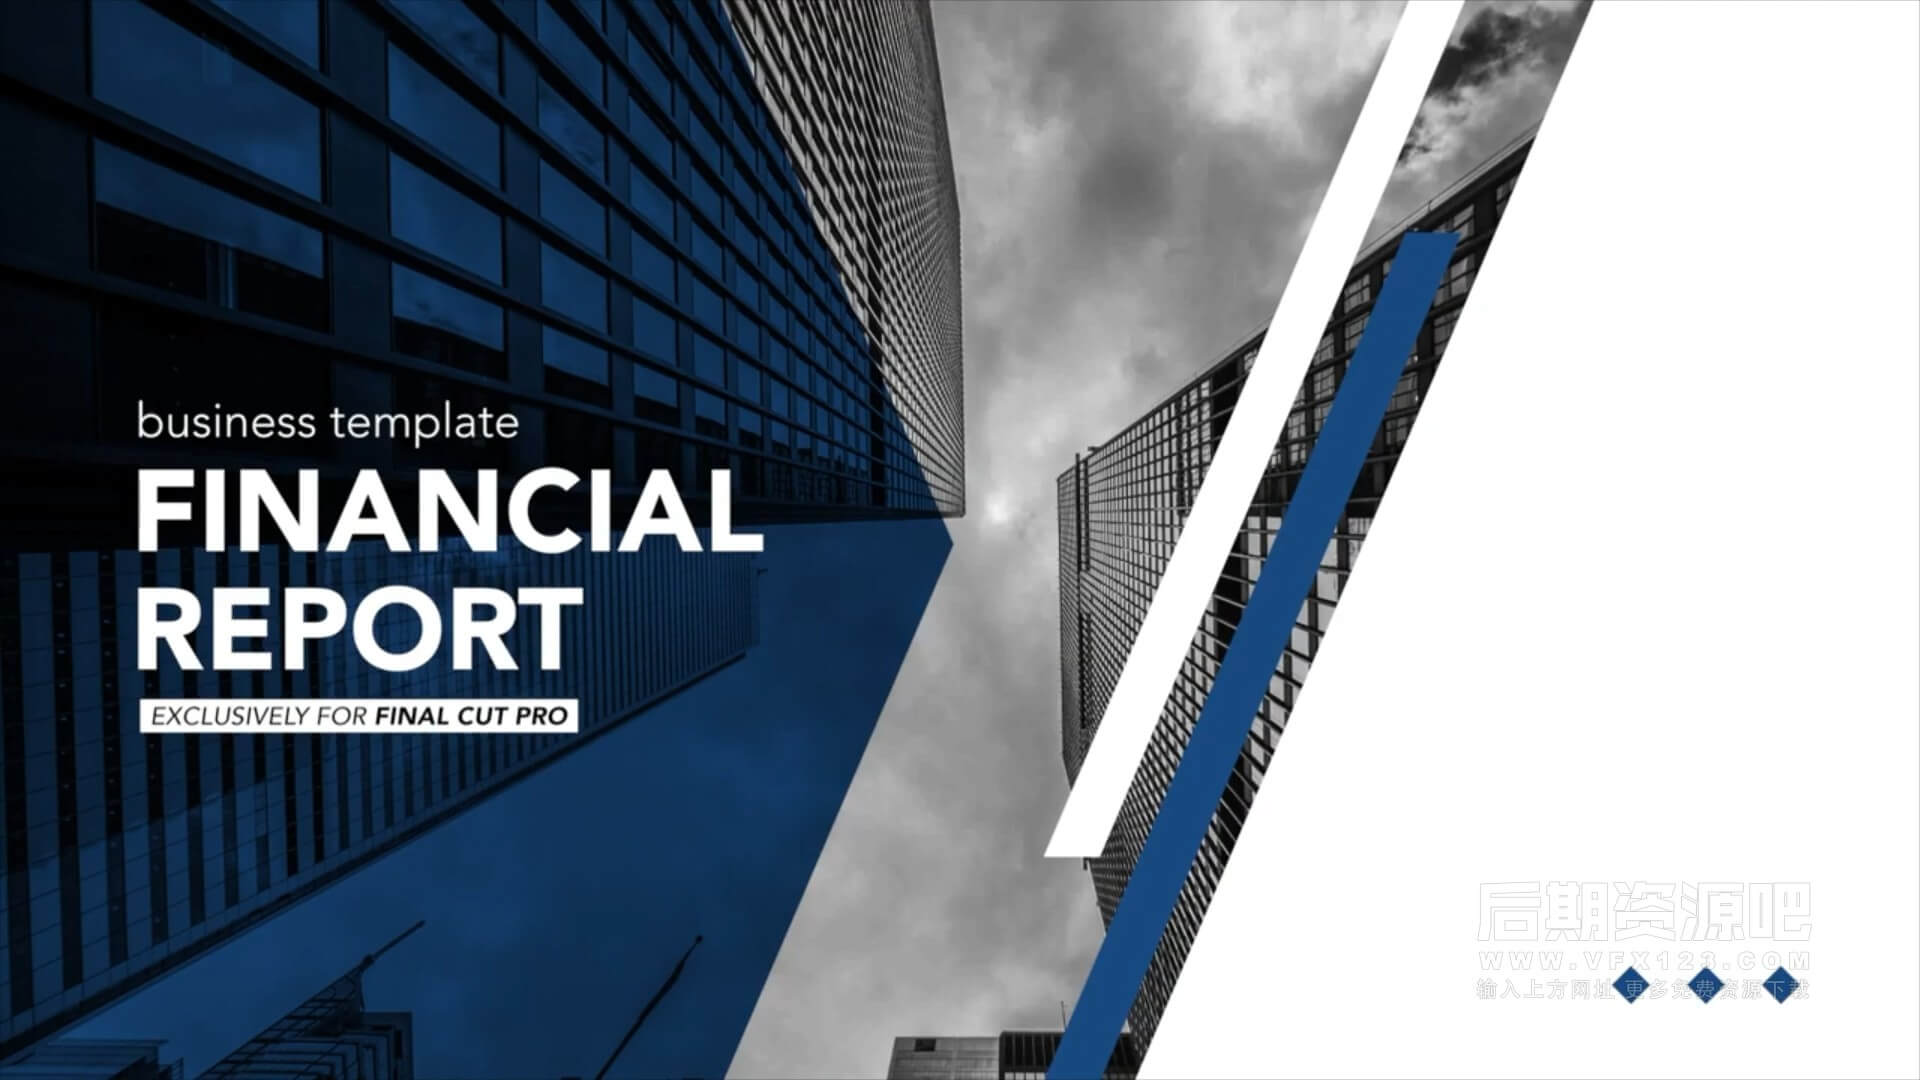 fcpx插件 商务公司数据统计信息图表演示幻灯片模板 Financial Report